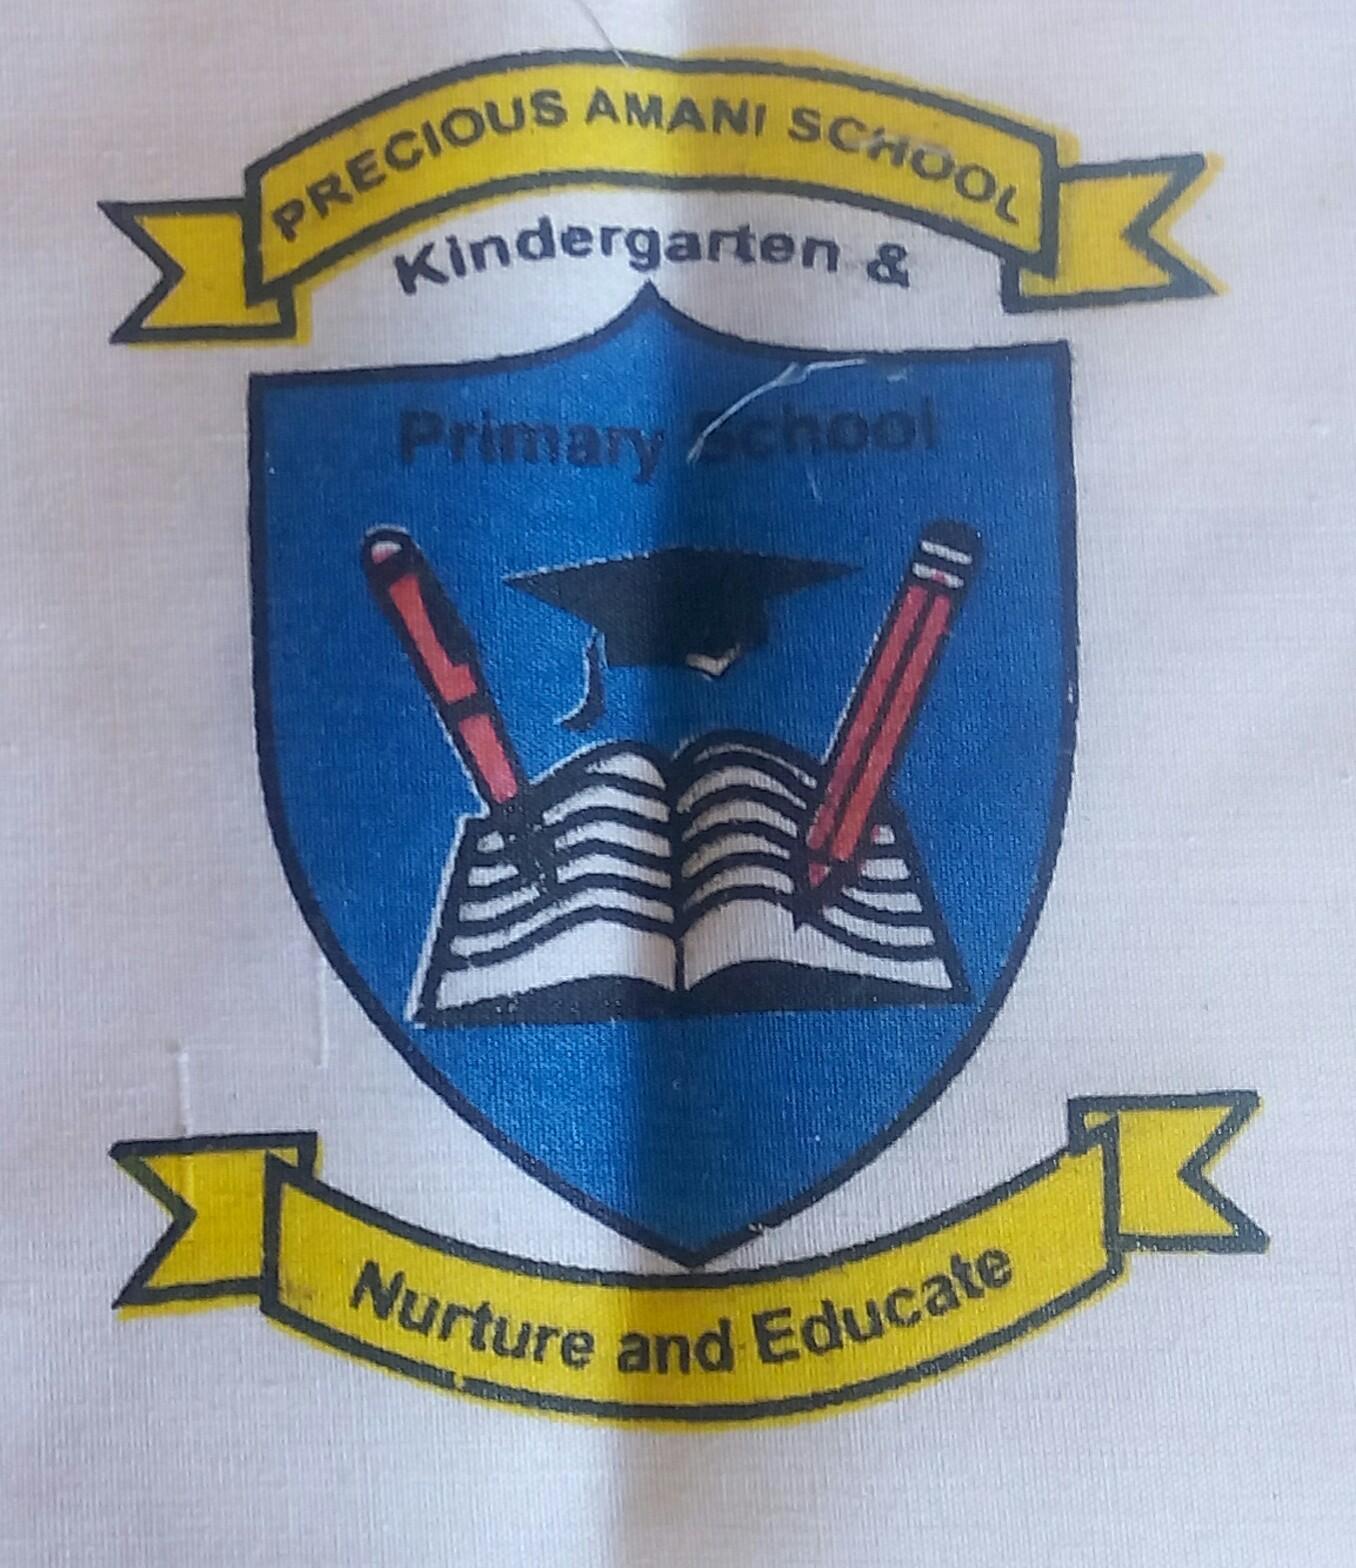 Precious Amani School